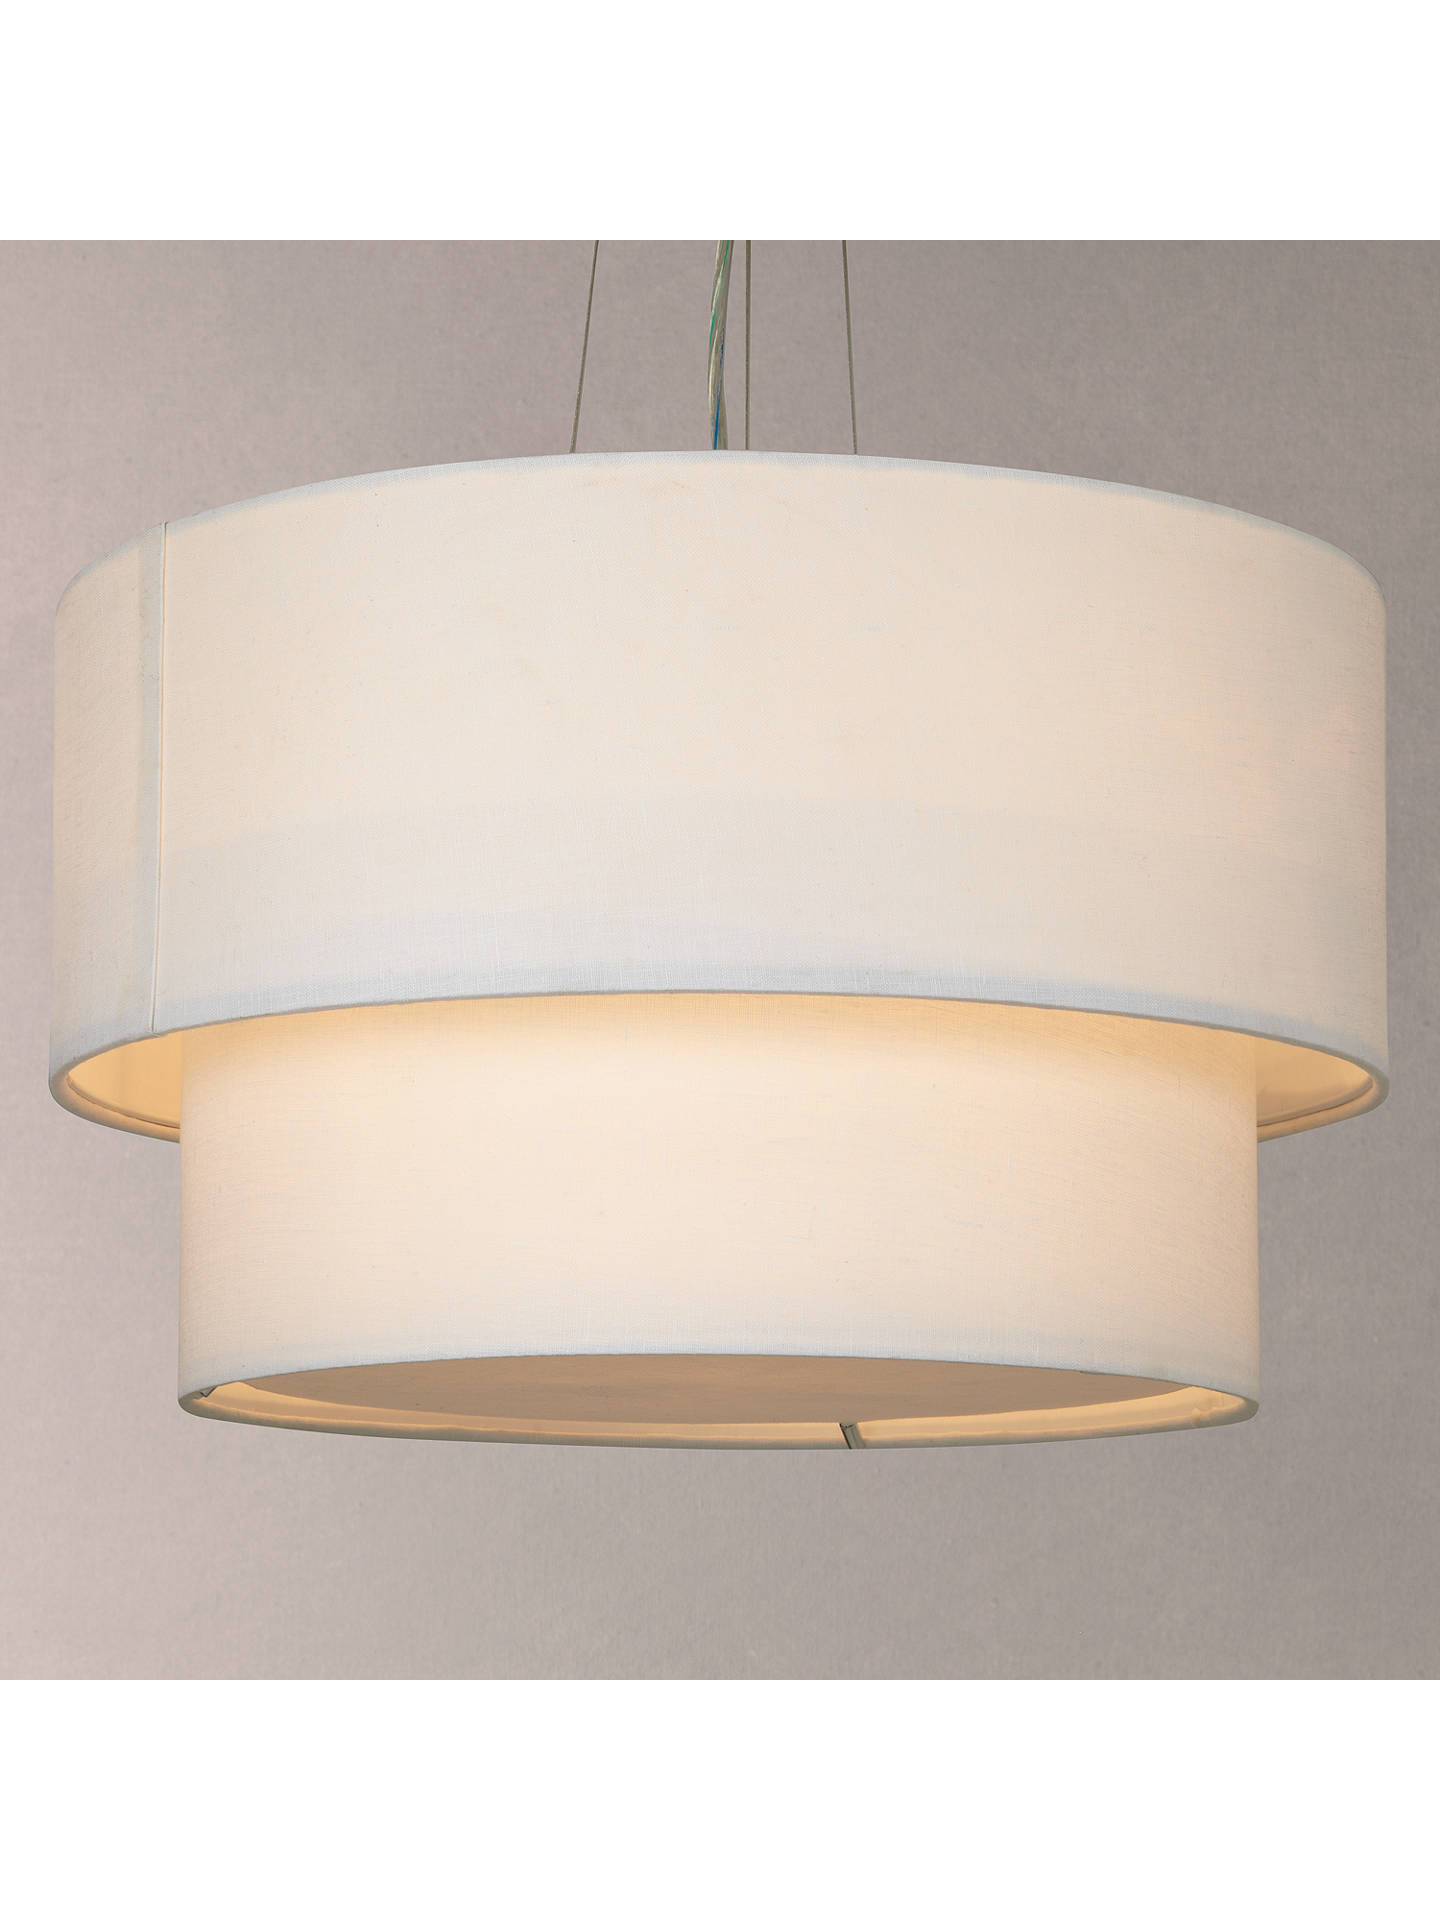 John Lewis & Partners Samantha Layers Diffuser Pendant Ceiling Light